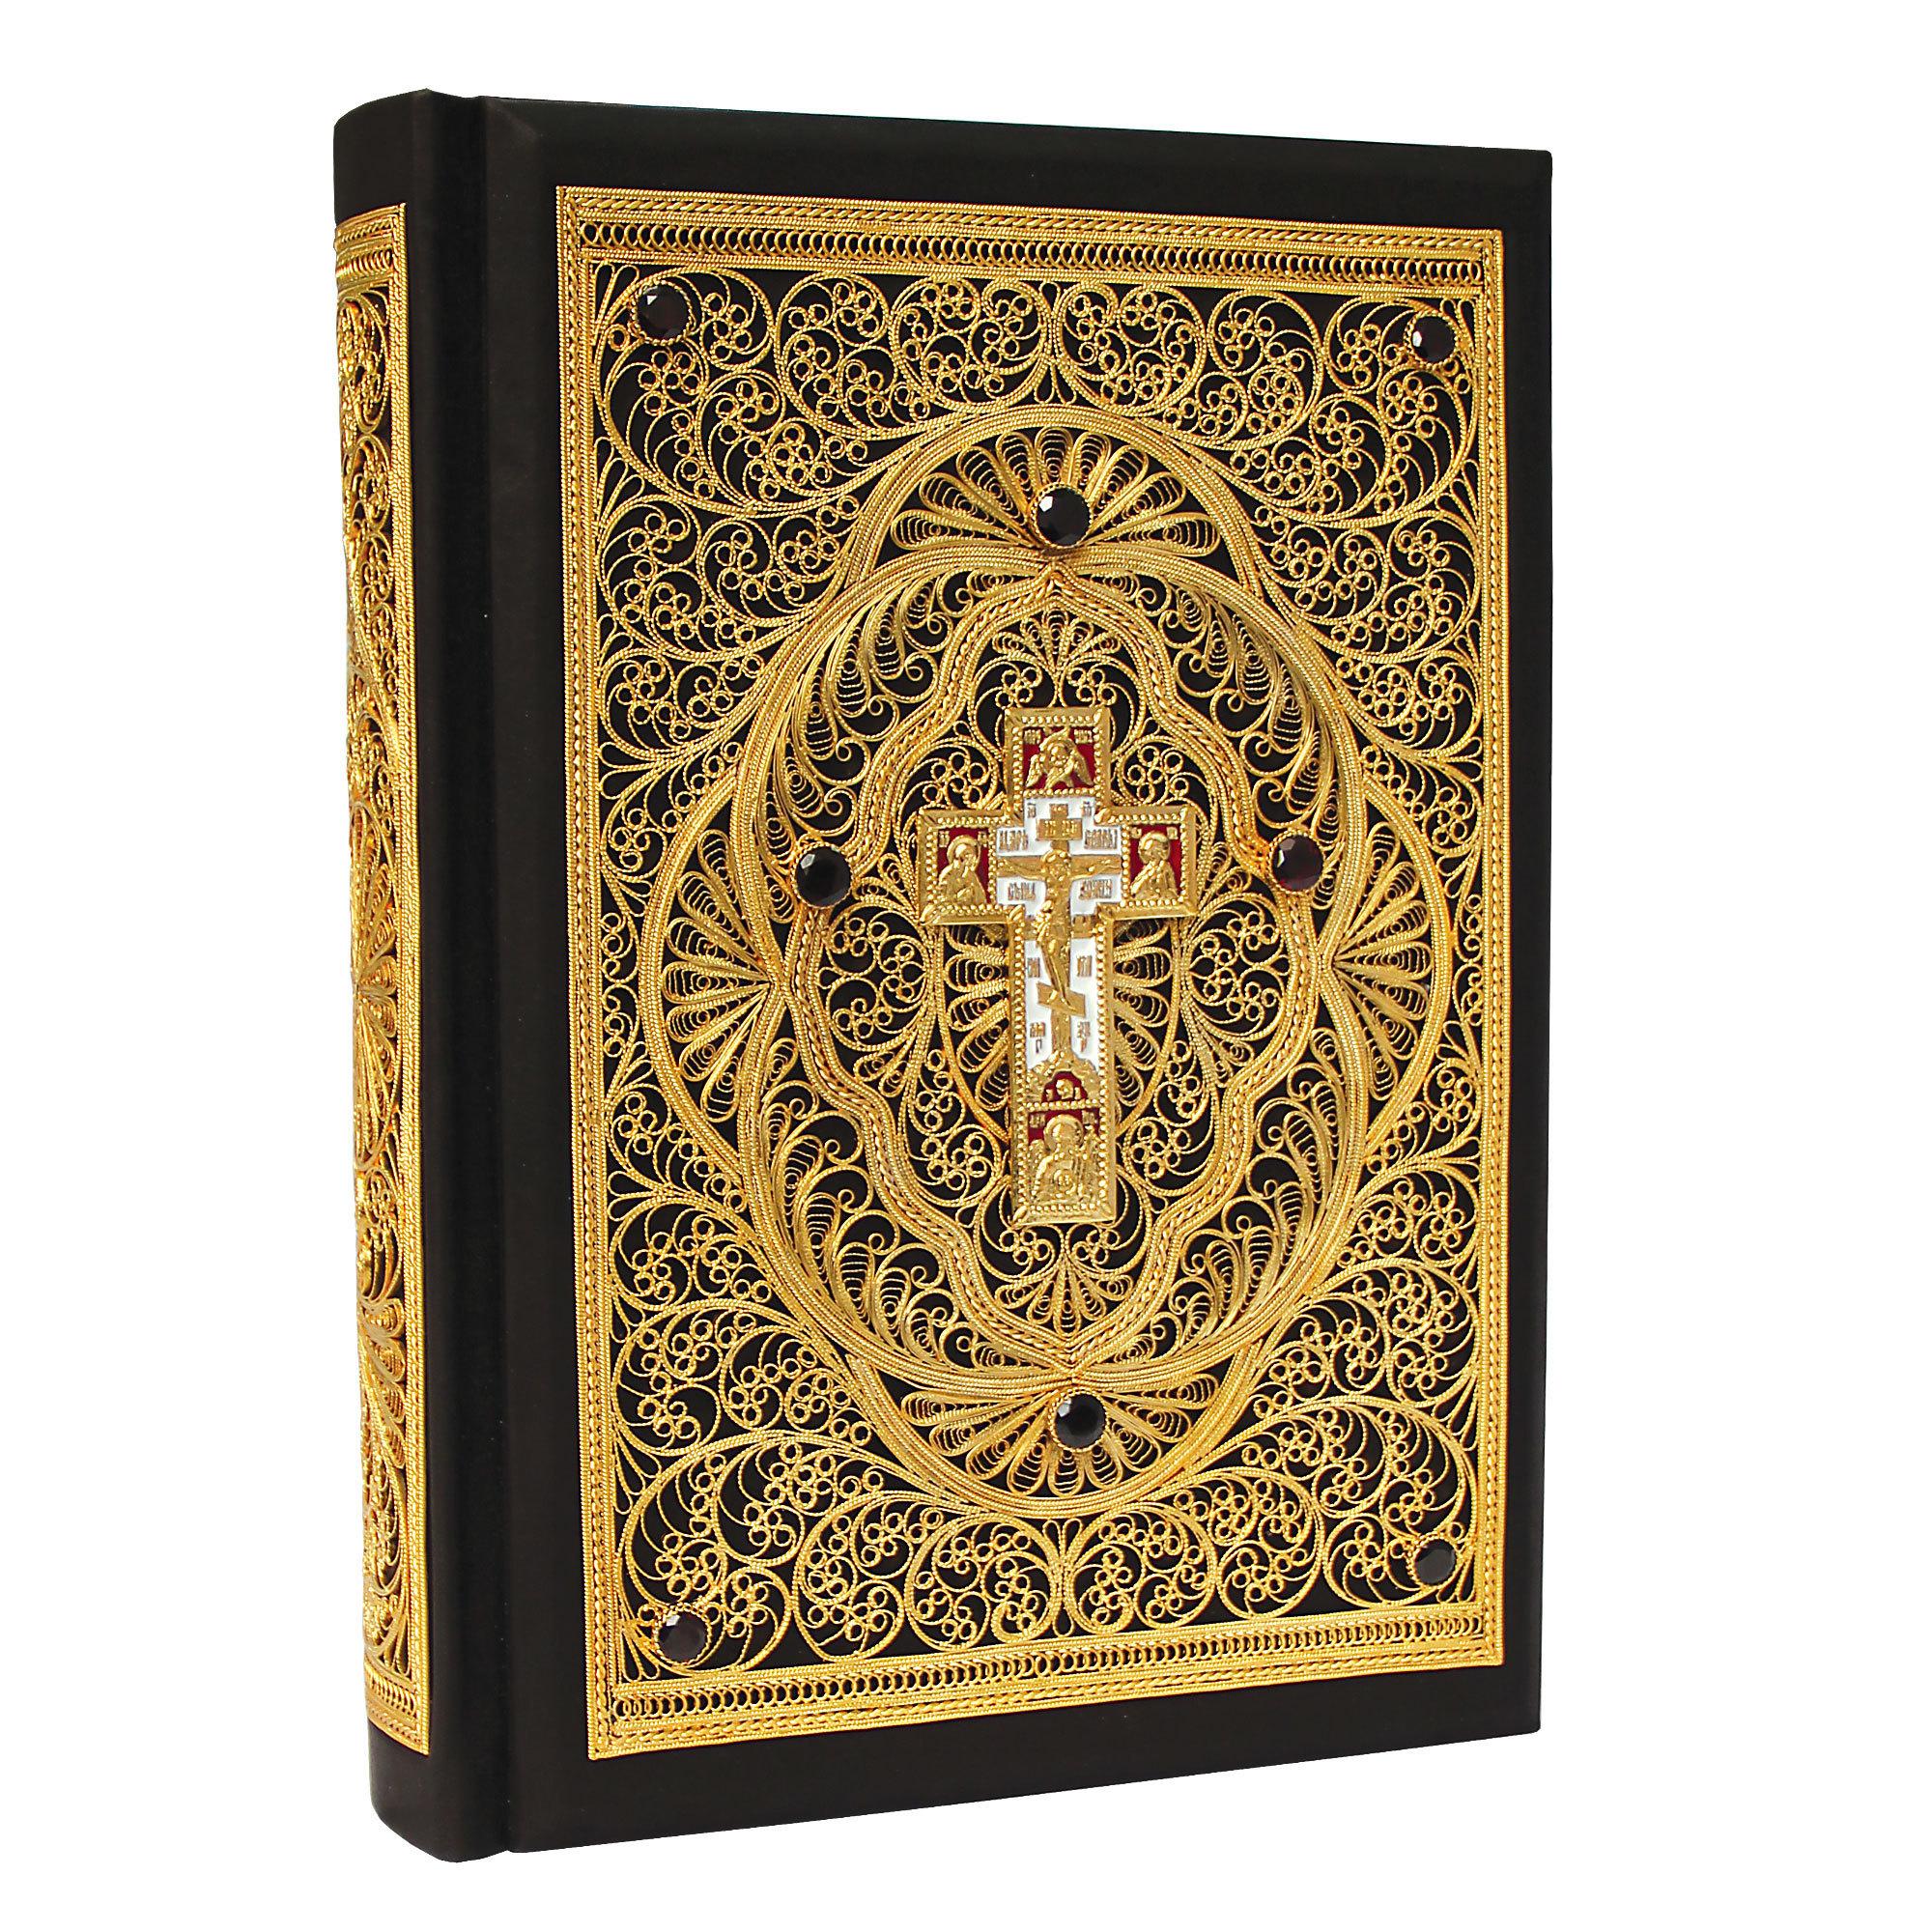 Библия с филигранью (золото) и гранатами